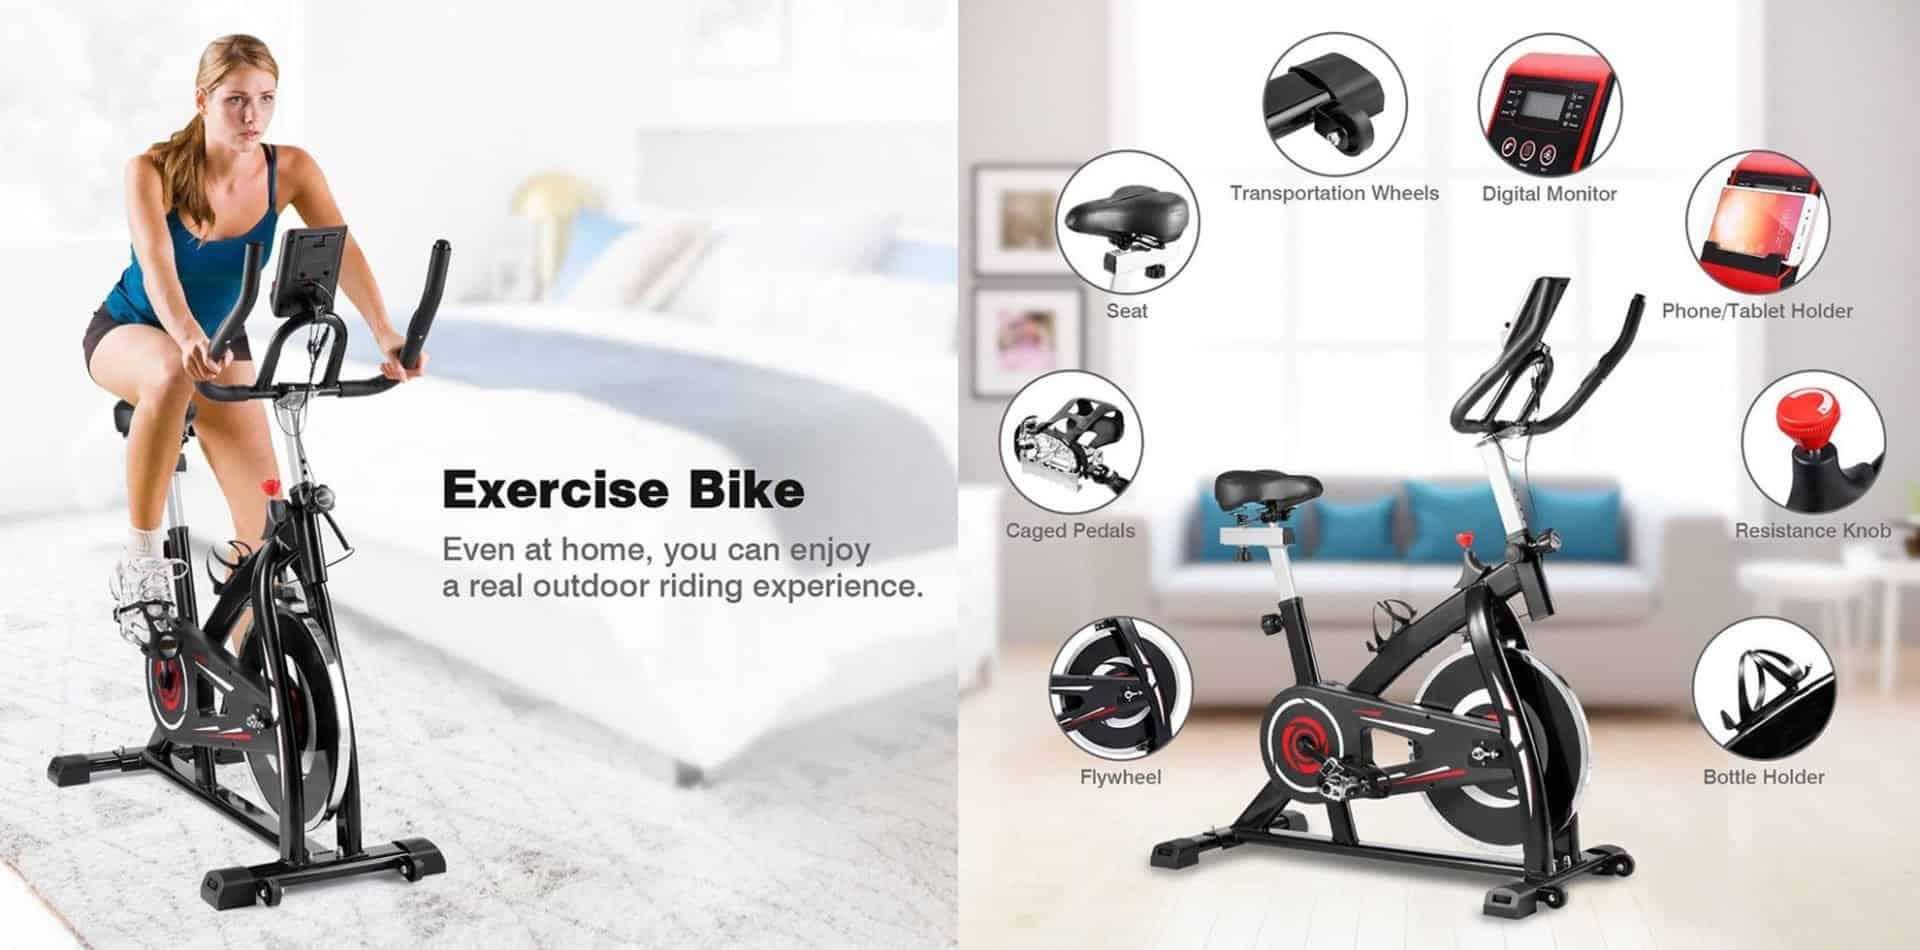 https://news.xiaomi-miui.gr/wp-content/uploads/2021/05/YS-S05-Indoor-Cycling-1920x950.jpg